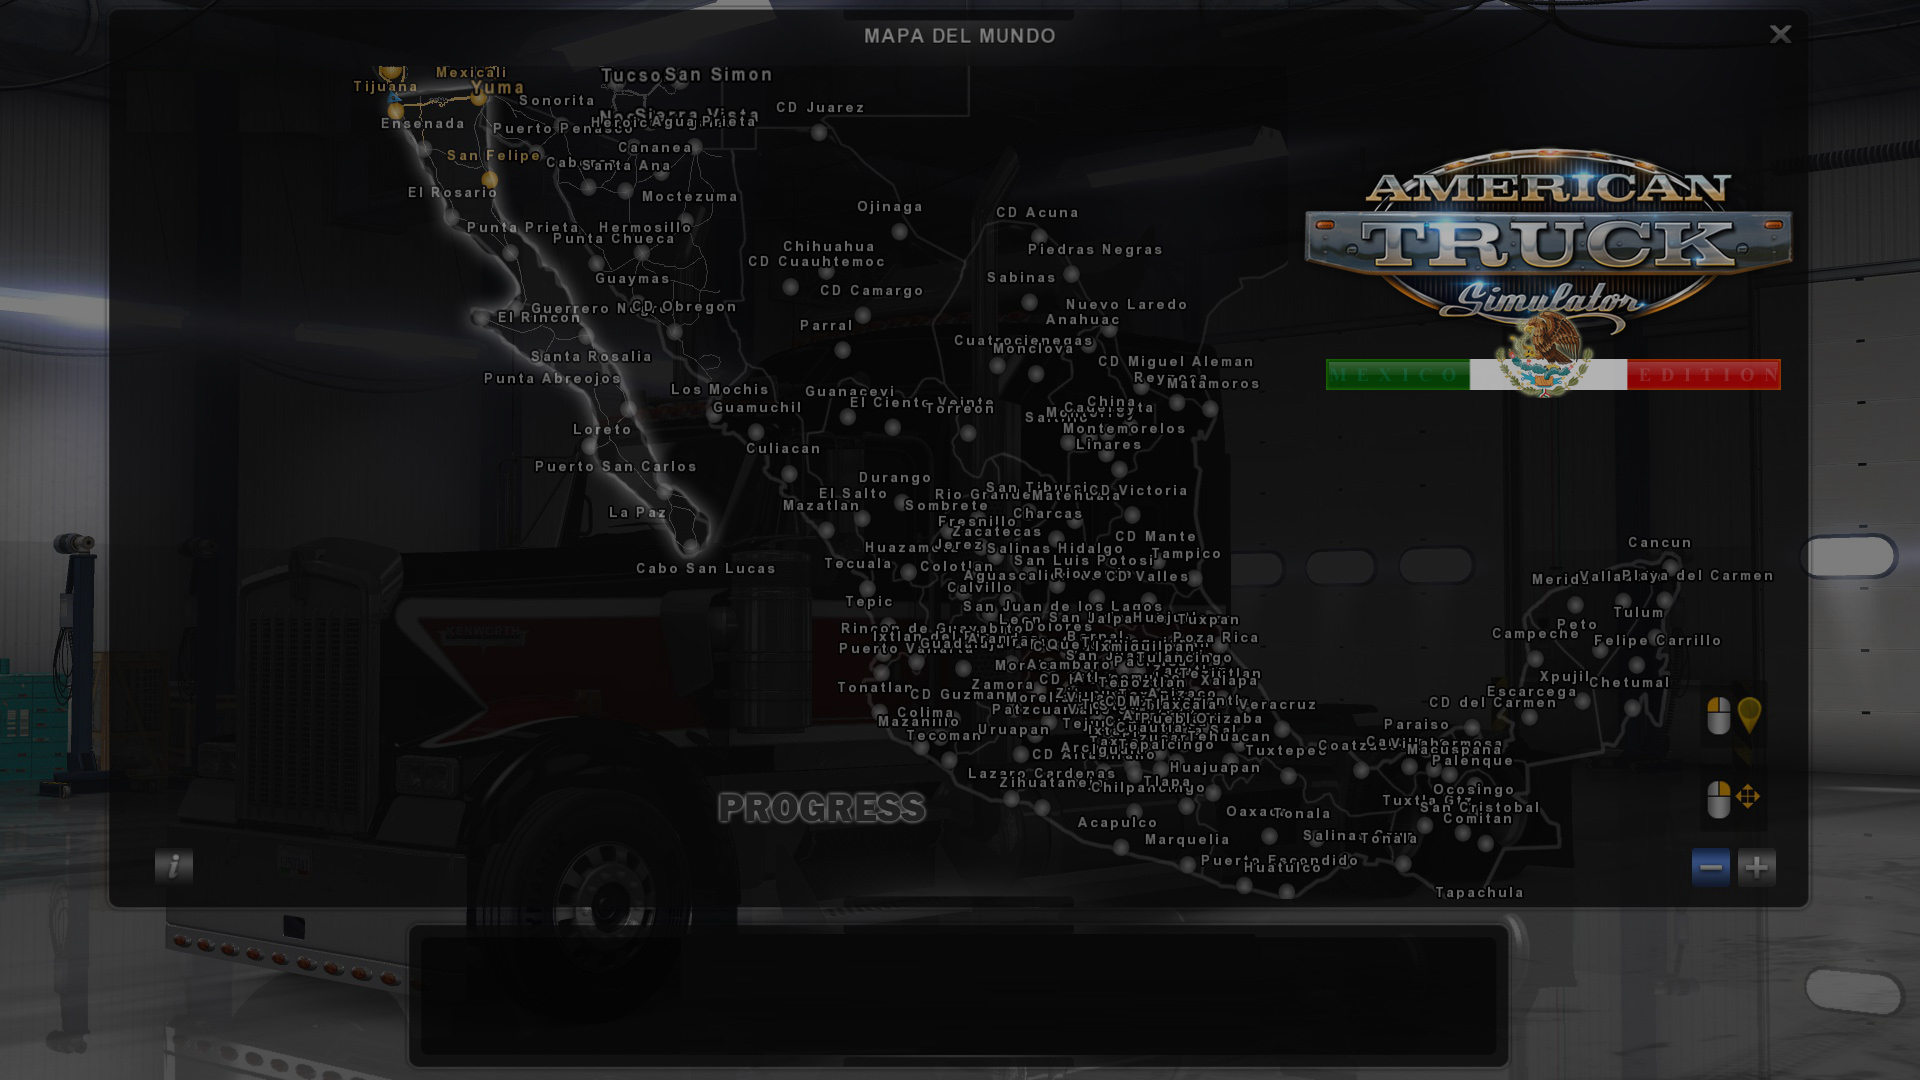 Viva Mexico Map v.1.0 (Baja California Sur) Project • ATS mods